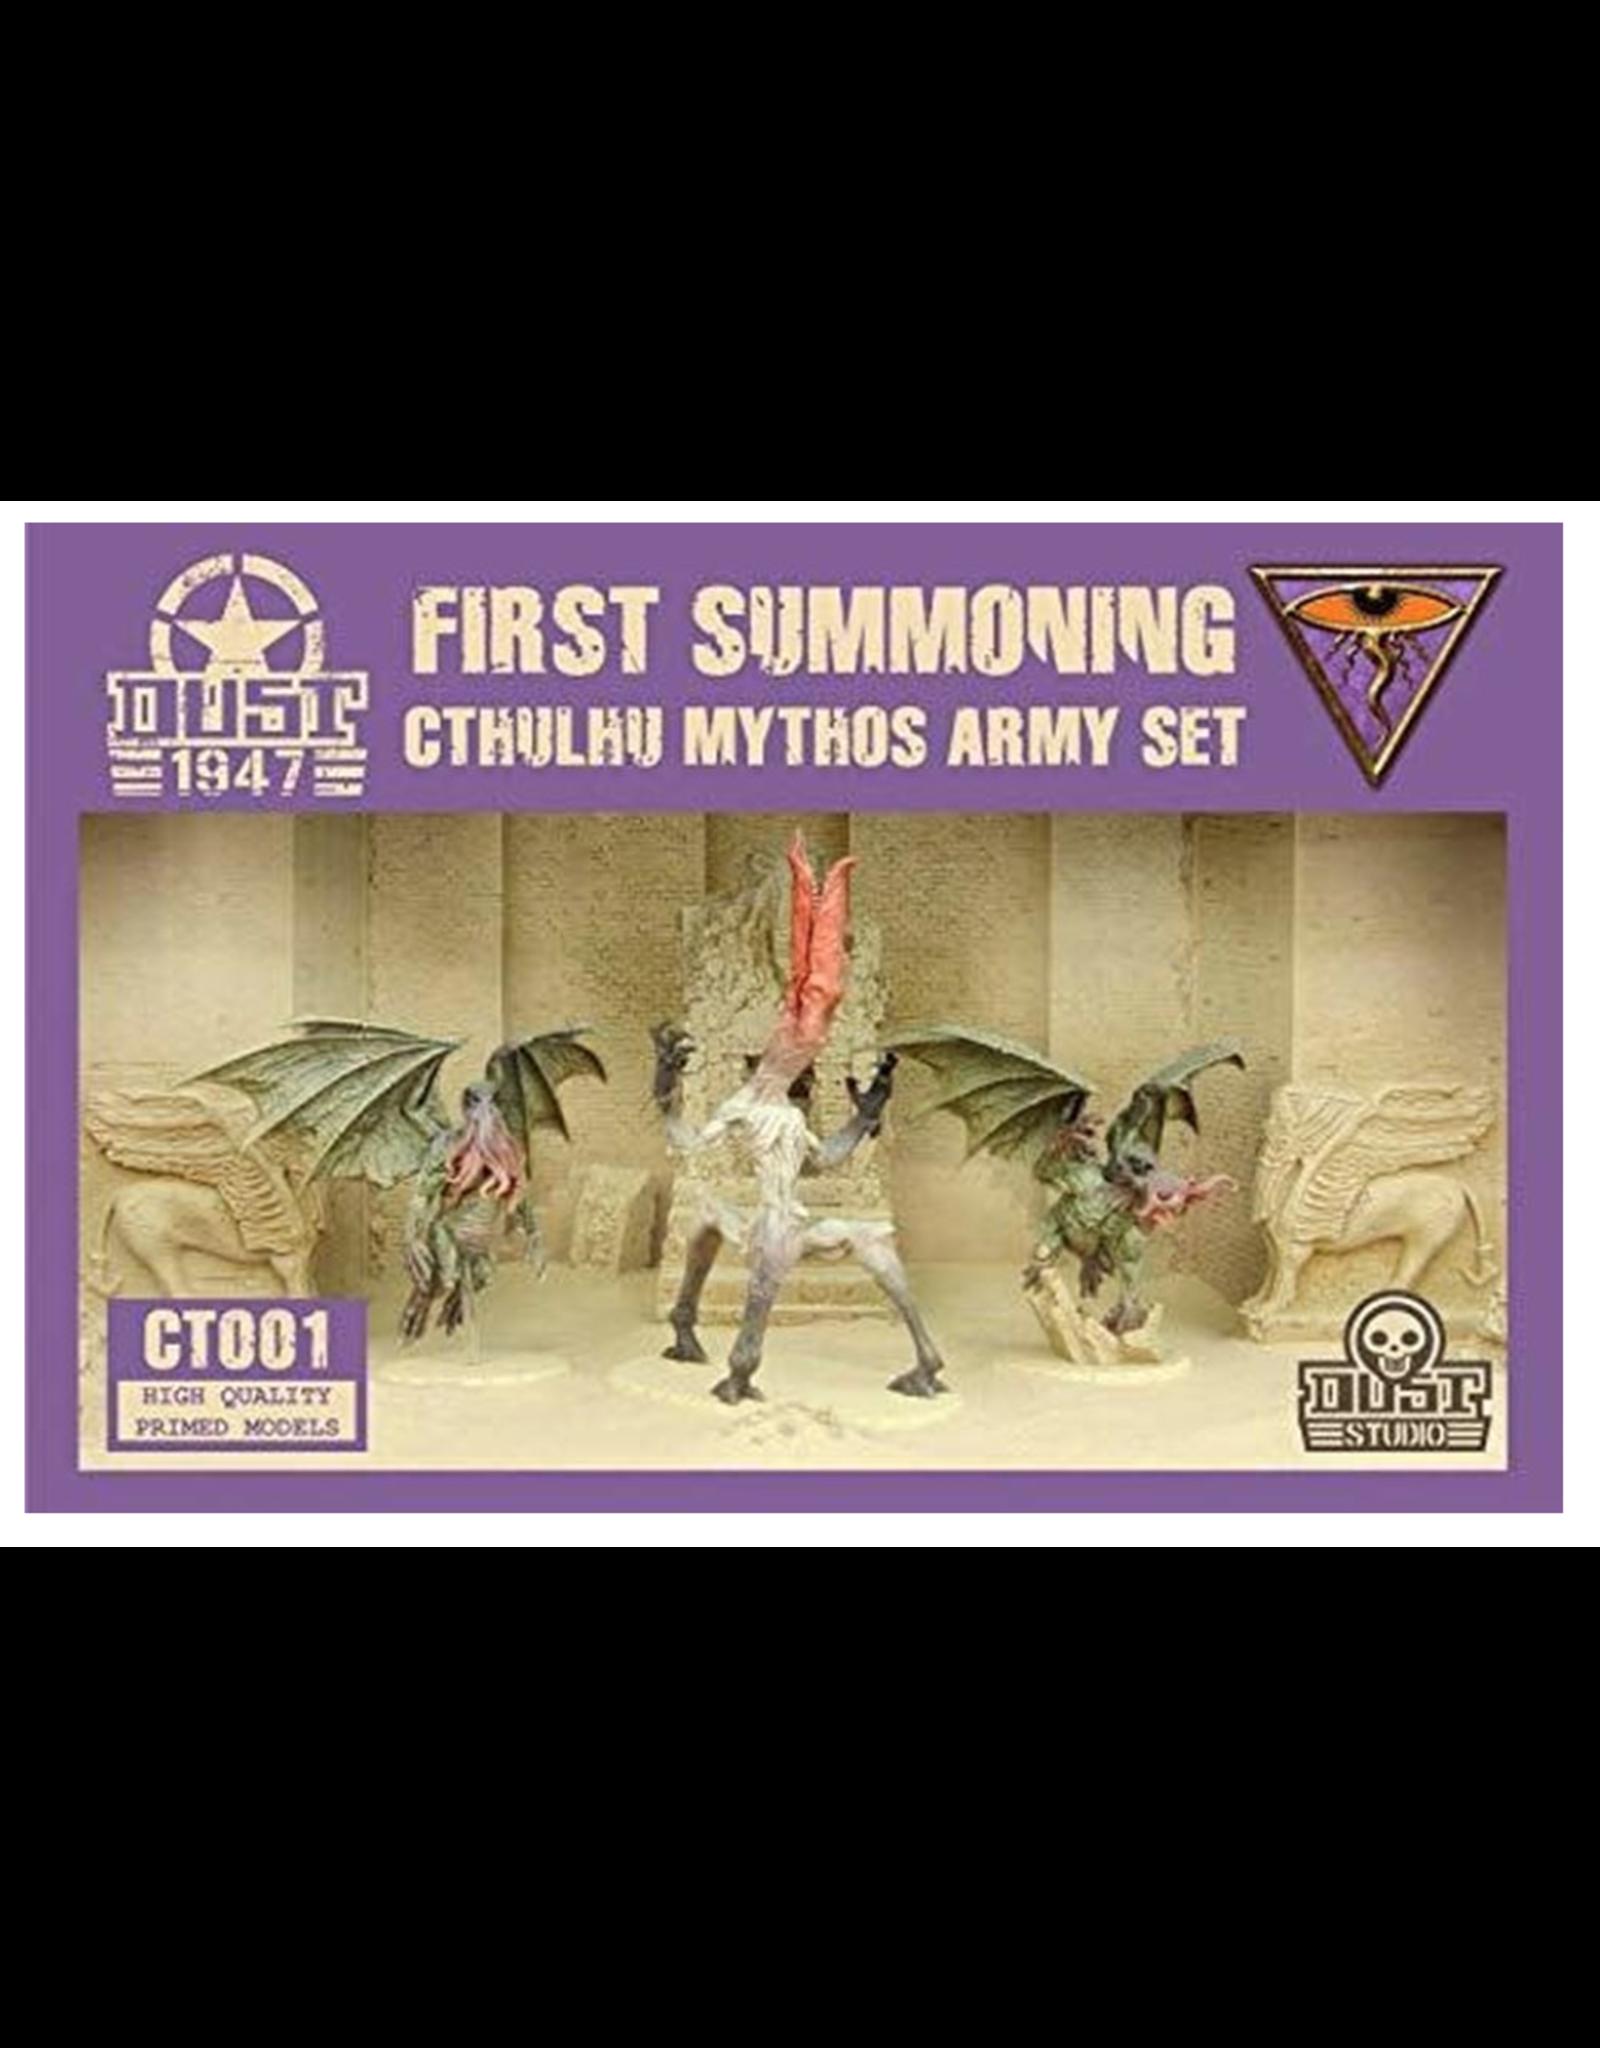 DUST 1947 Cthulhu Mythos Army Set